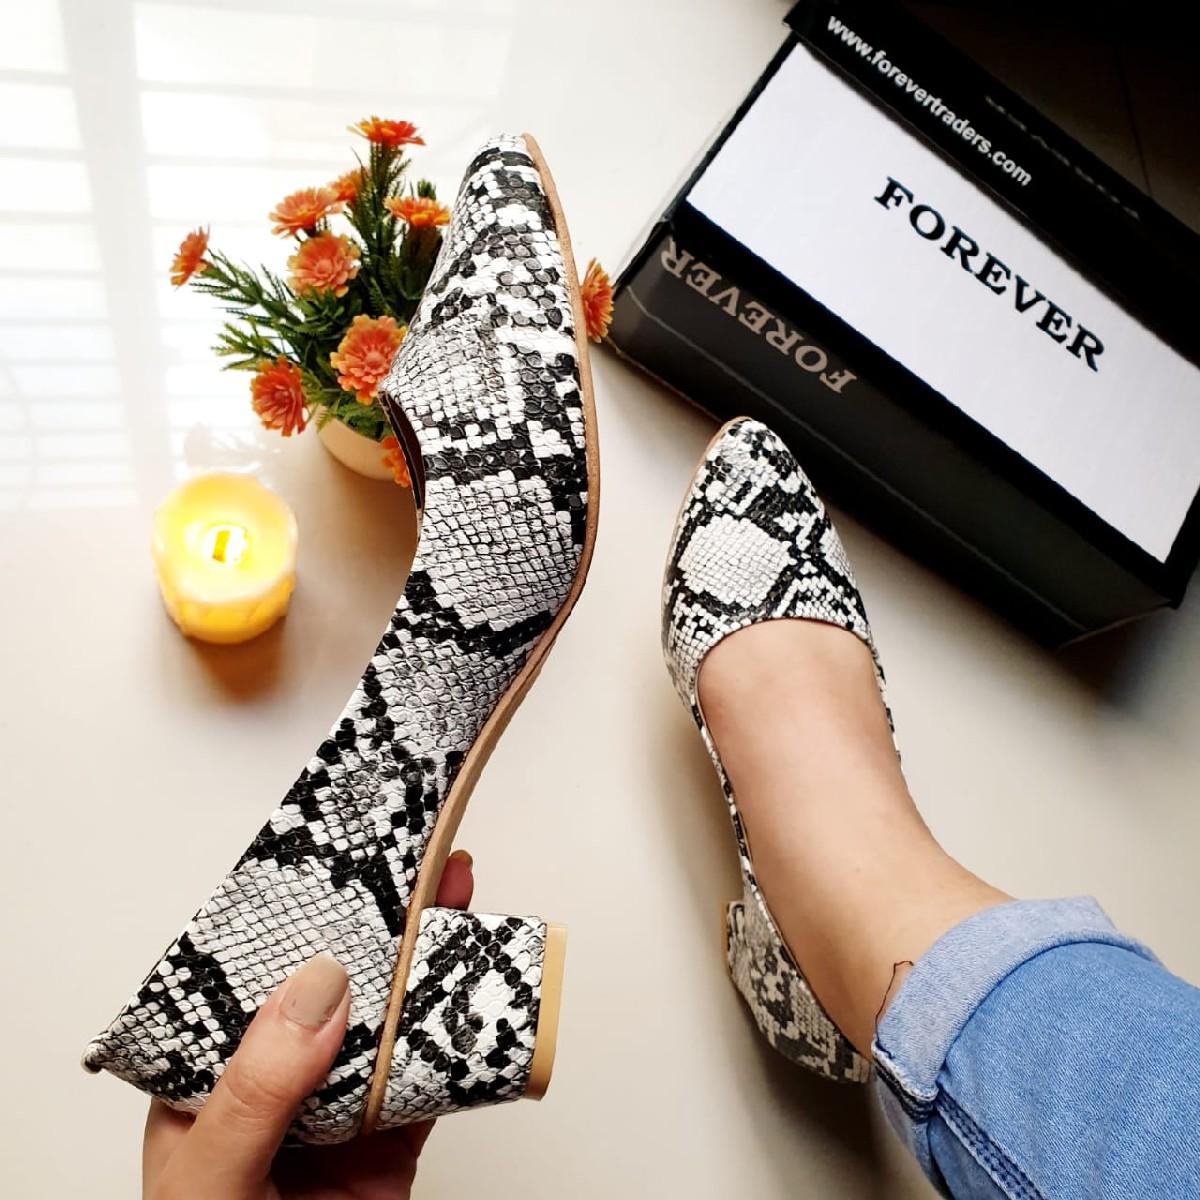 Stylish Pumps Shoes for Women Almond Toe Block Heel SH52